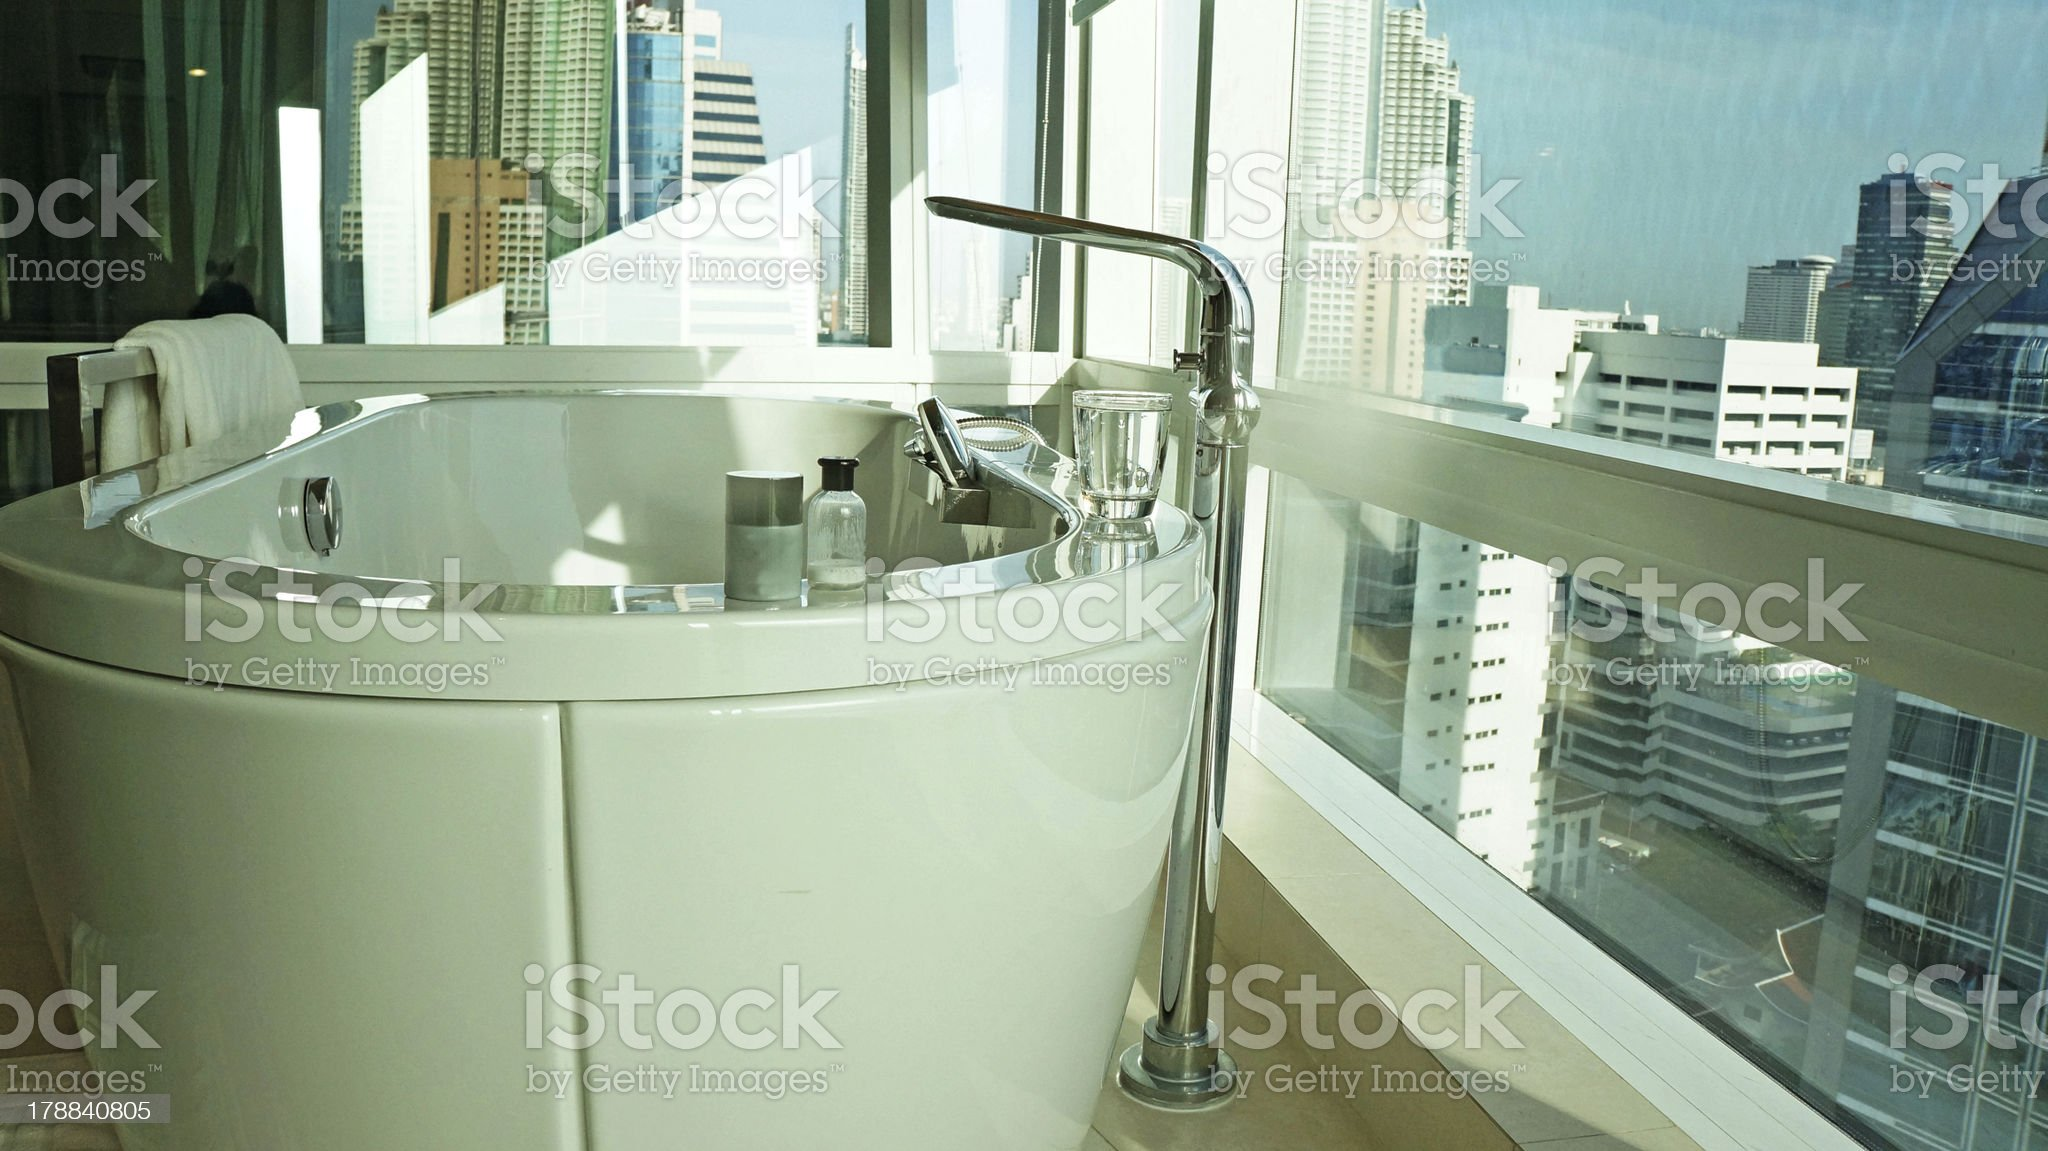 Bathroom with bath tub royalty-free stock photo